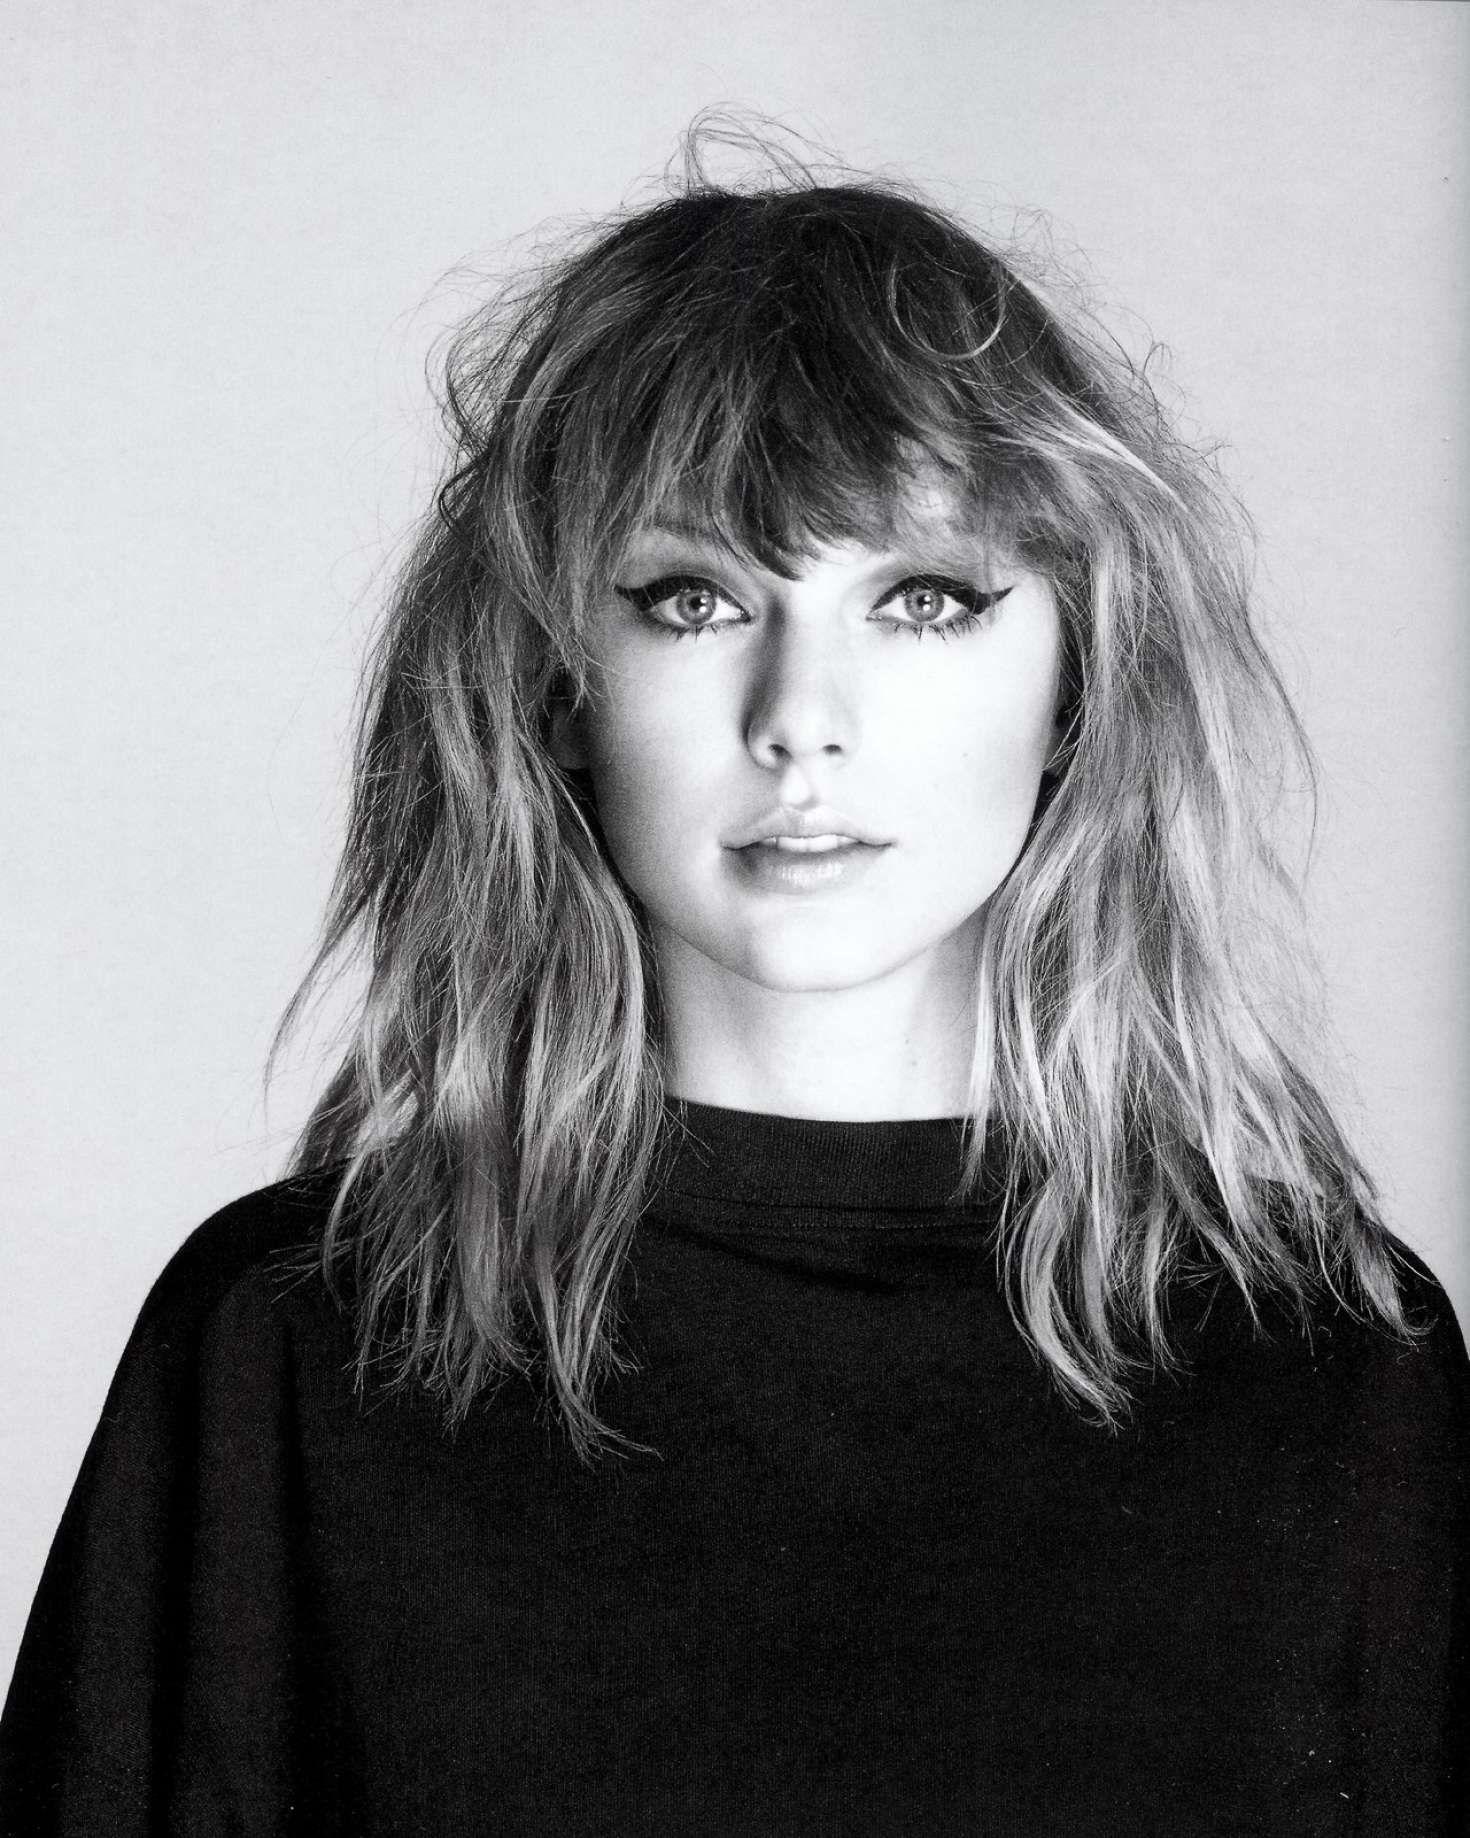 Taylor Swift Reputation Photoshoots On We Heart It